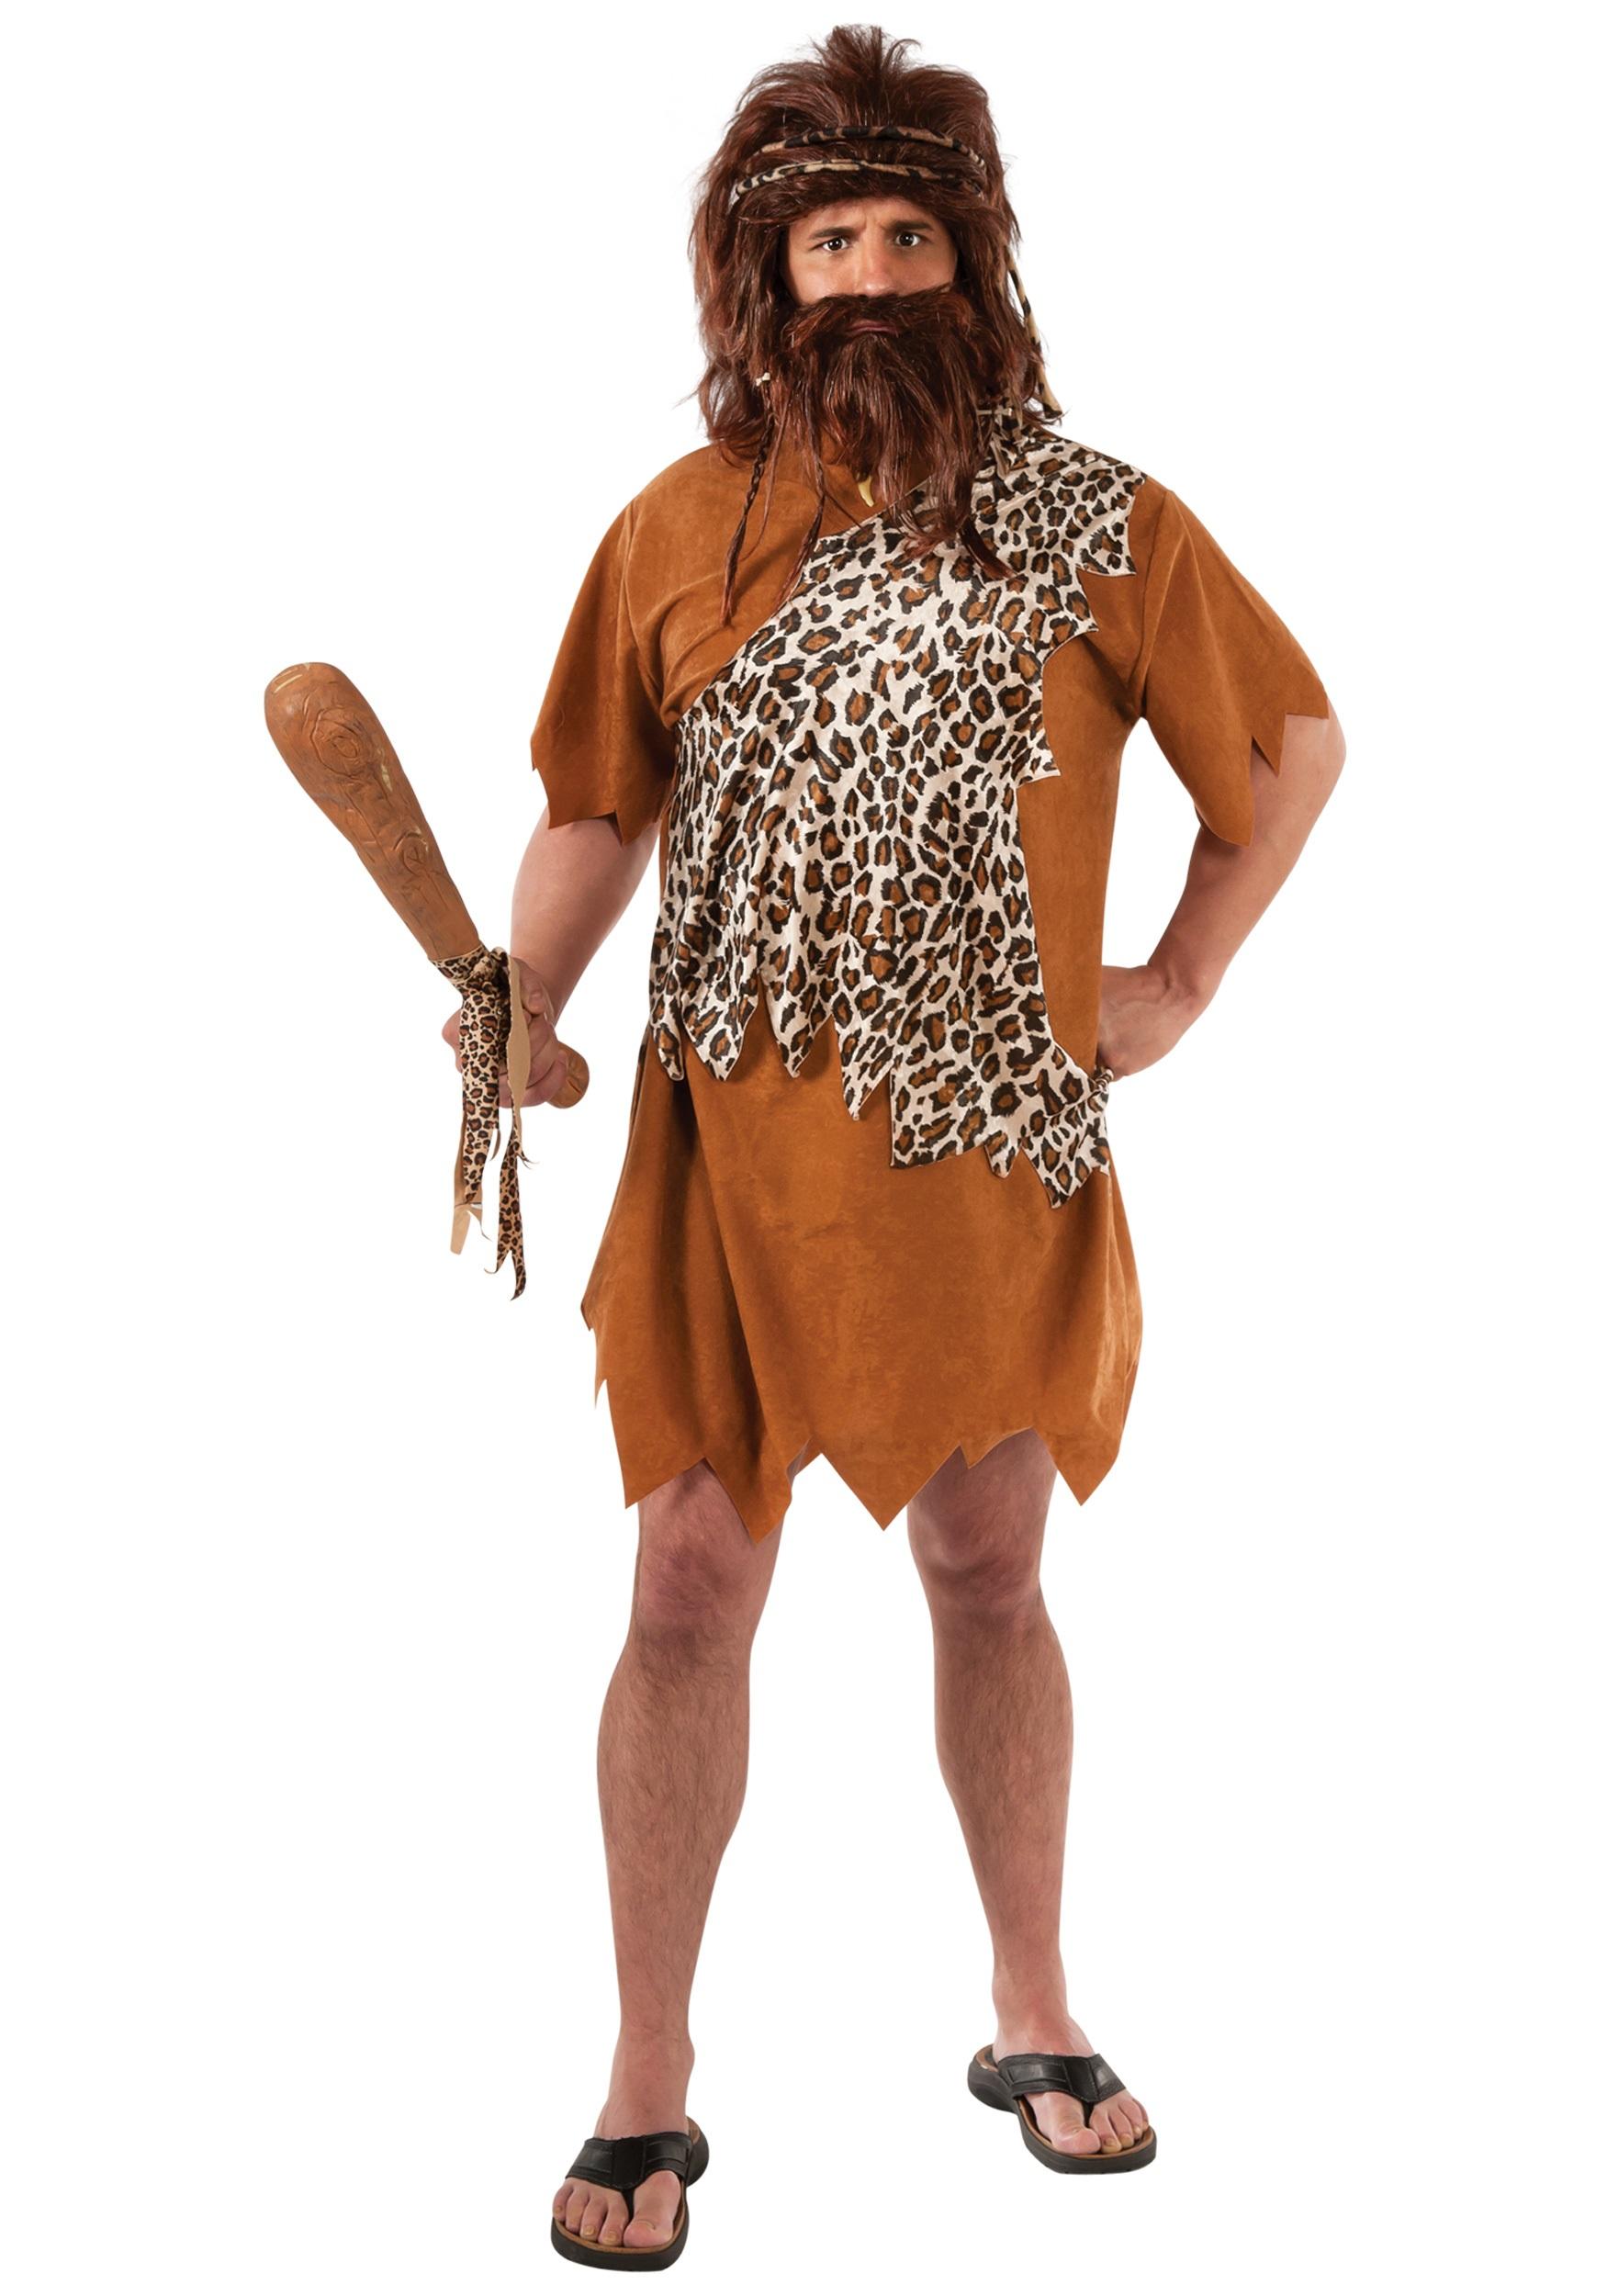 Caveman Plus Size Costume  sc 1 st  Halloween Costumes & Caveman Plus Size Costume - Halloween Costumes